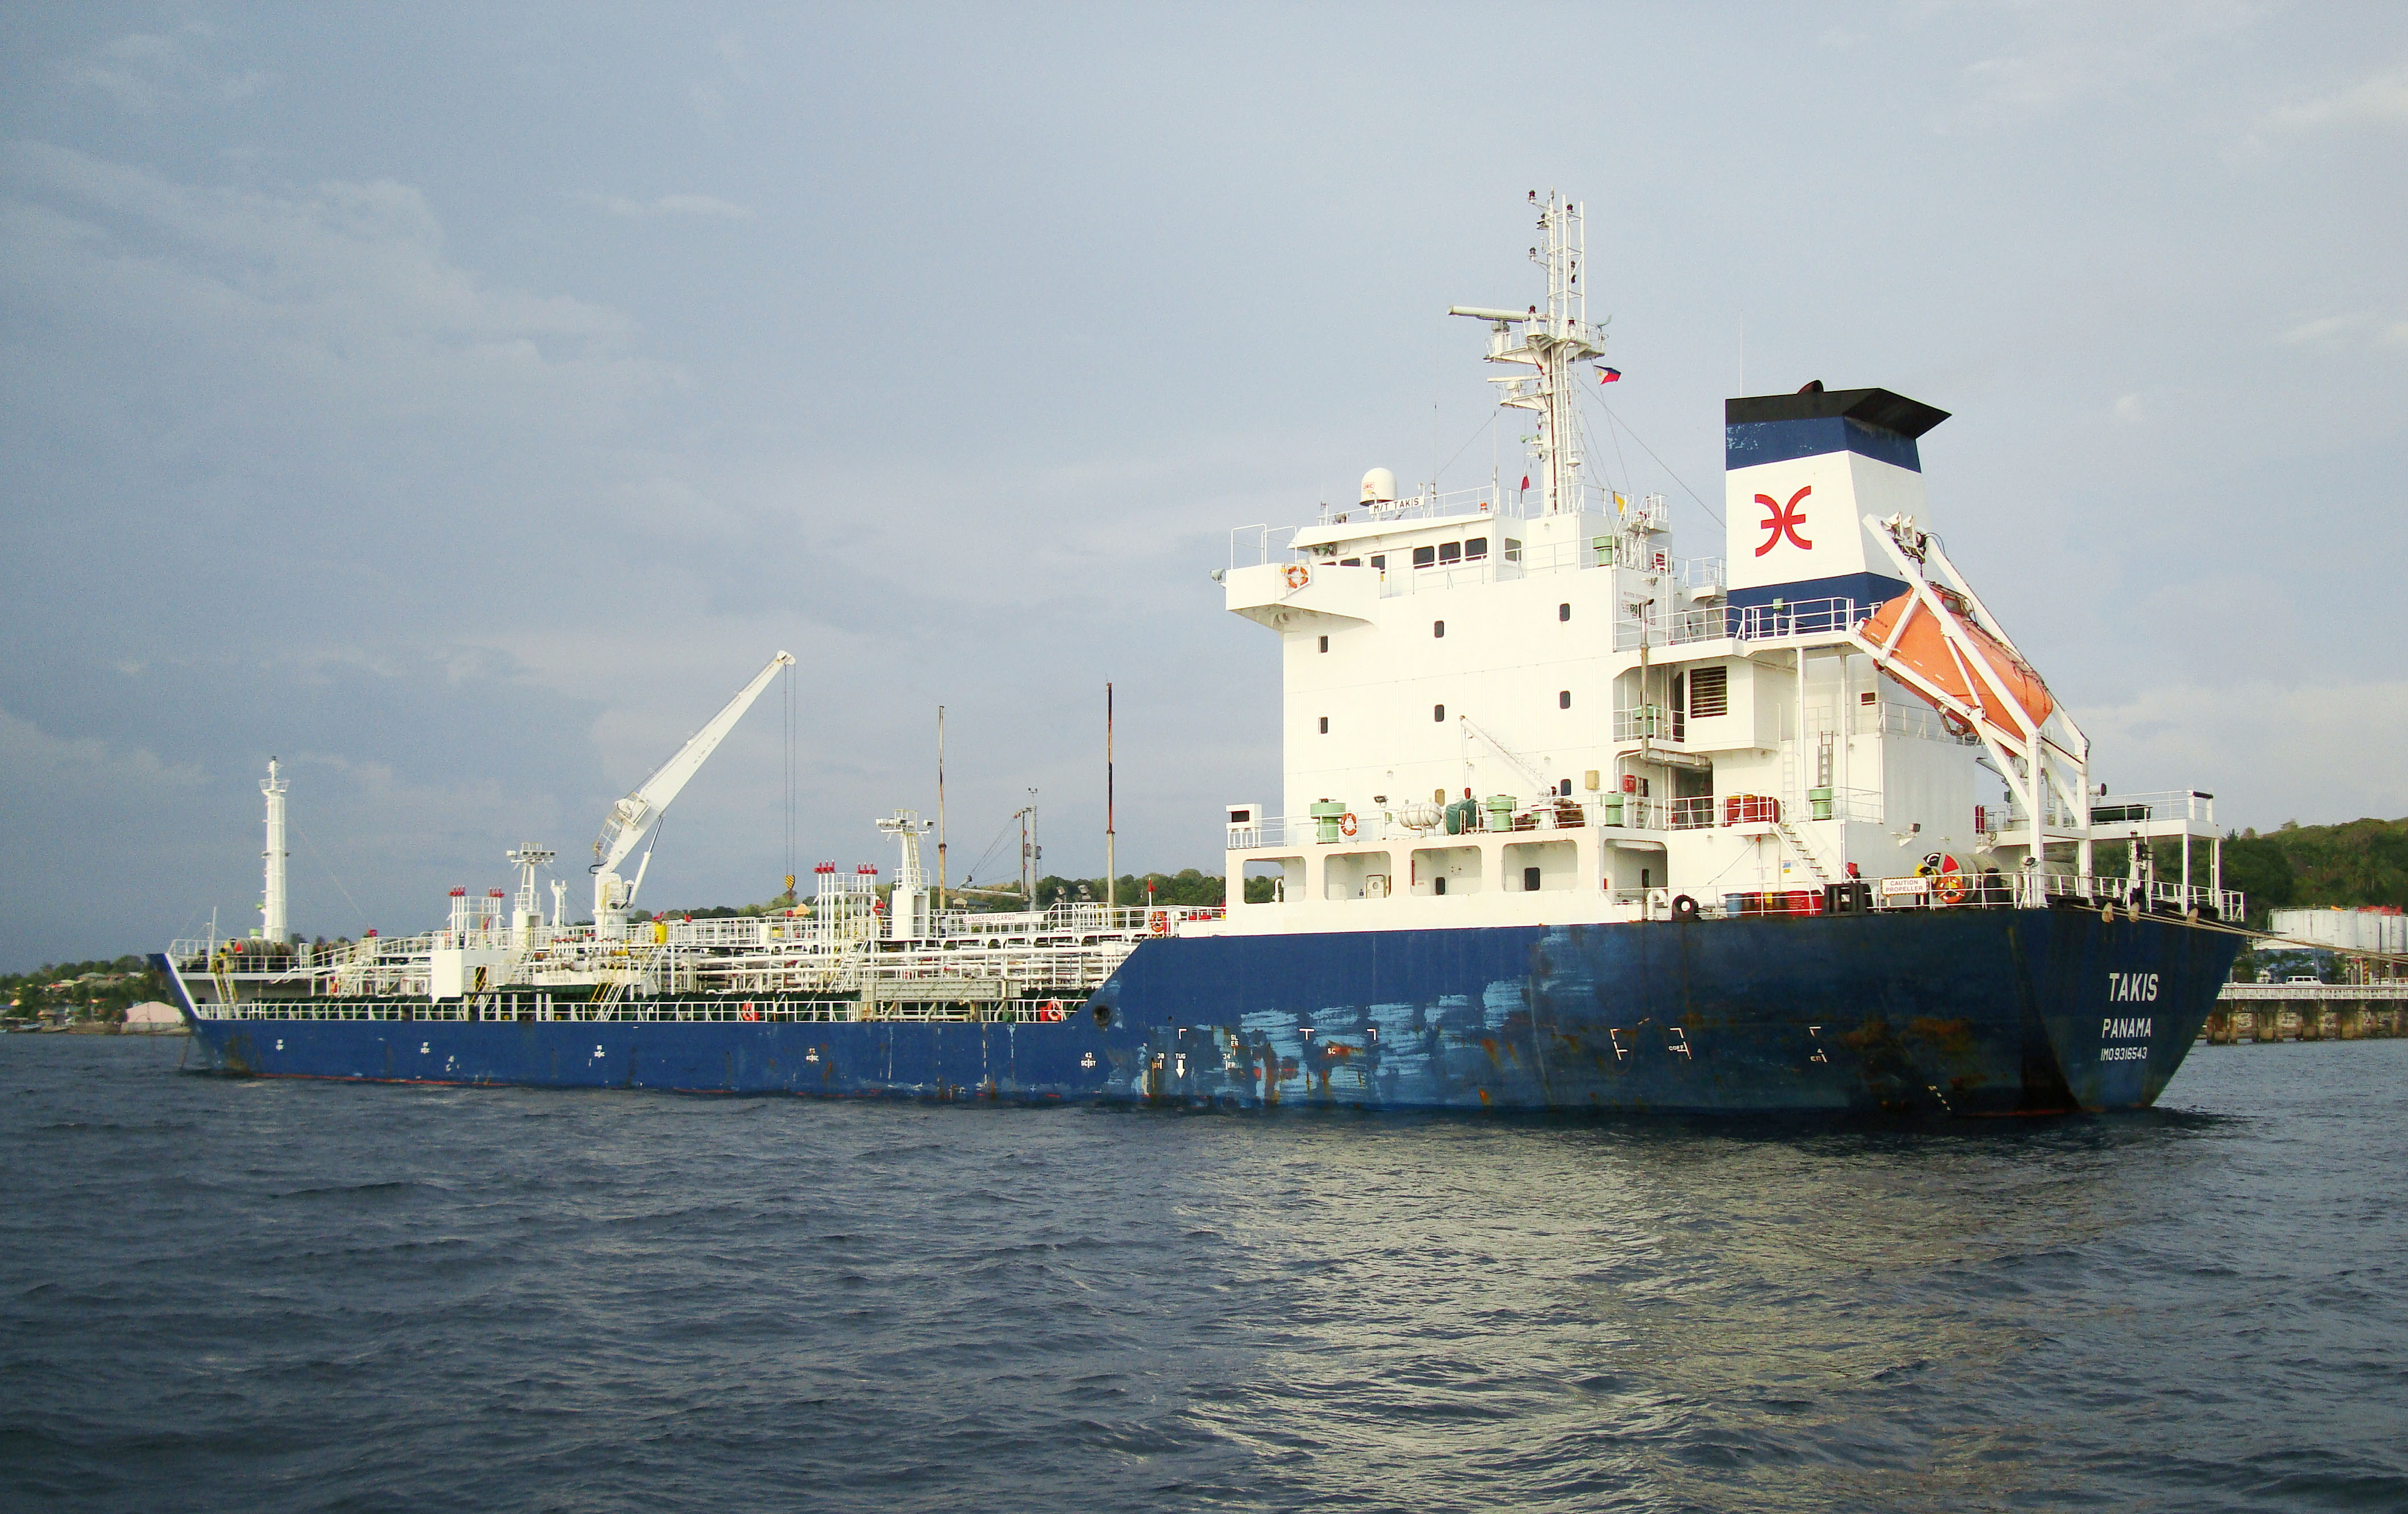 IMO 9316543 MV Takis Panamanian Batangus Philippines 03